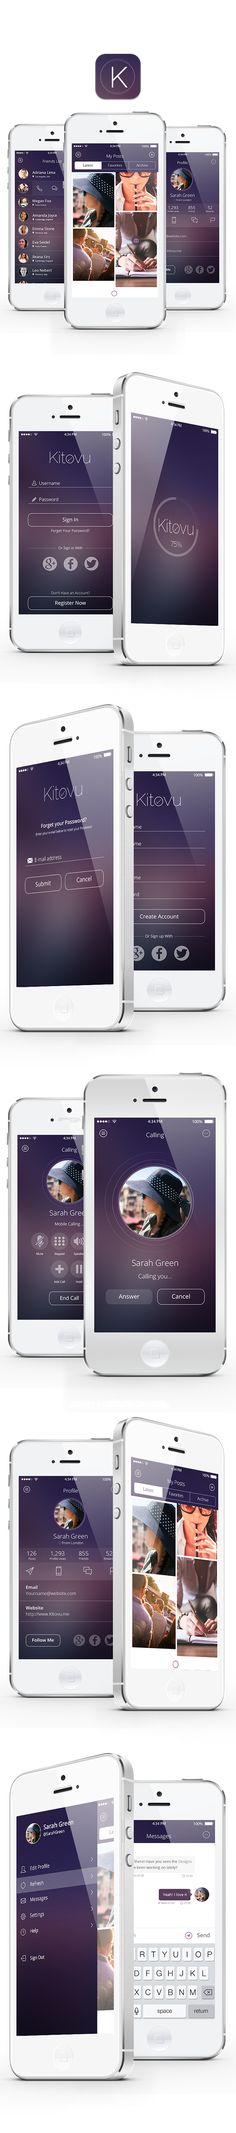 Kitovu IOS 8 UI/UX App Design by Doaa Fadally, via Behance